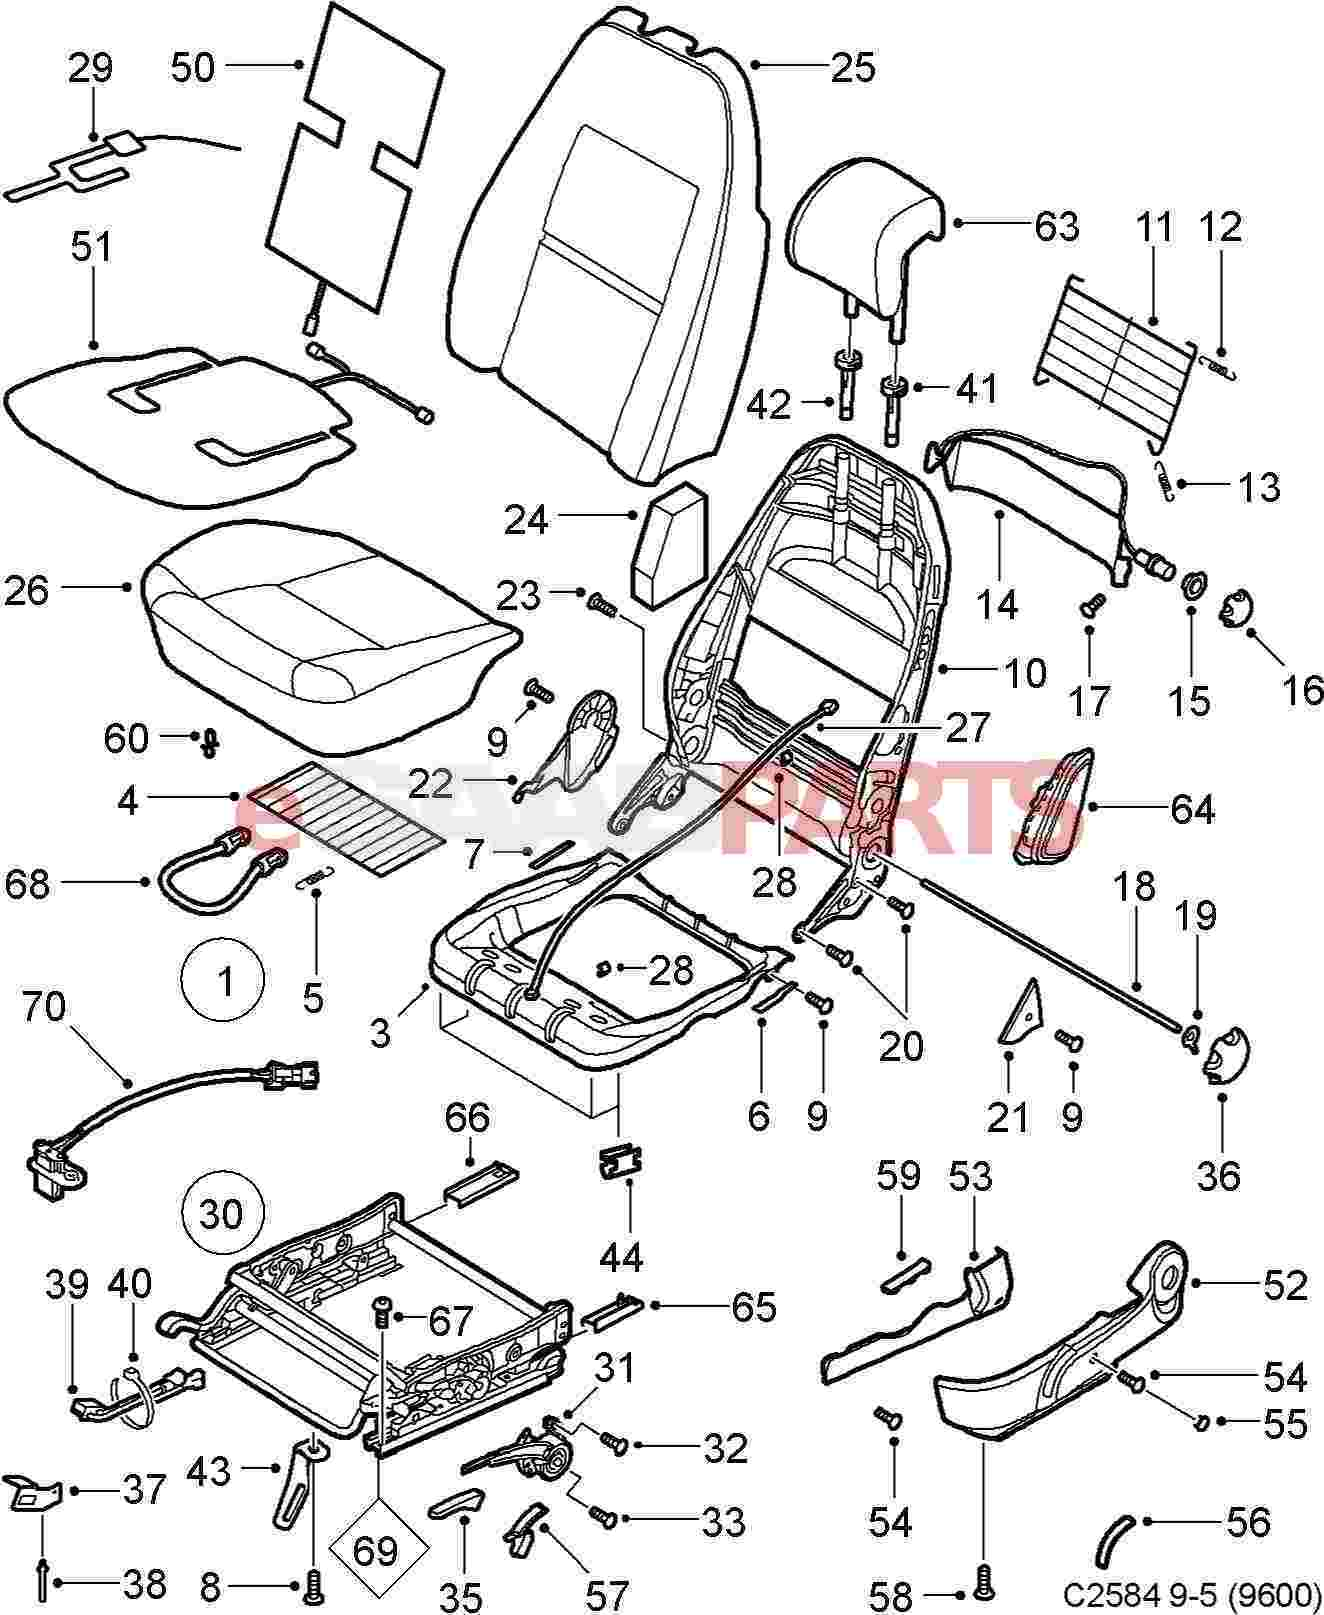 2006 saab 9 3 wiring diagram nissan sentra radio 12760542 passenger seat occupancy sensor genuine